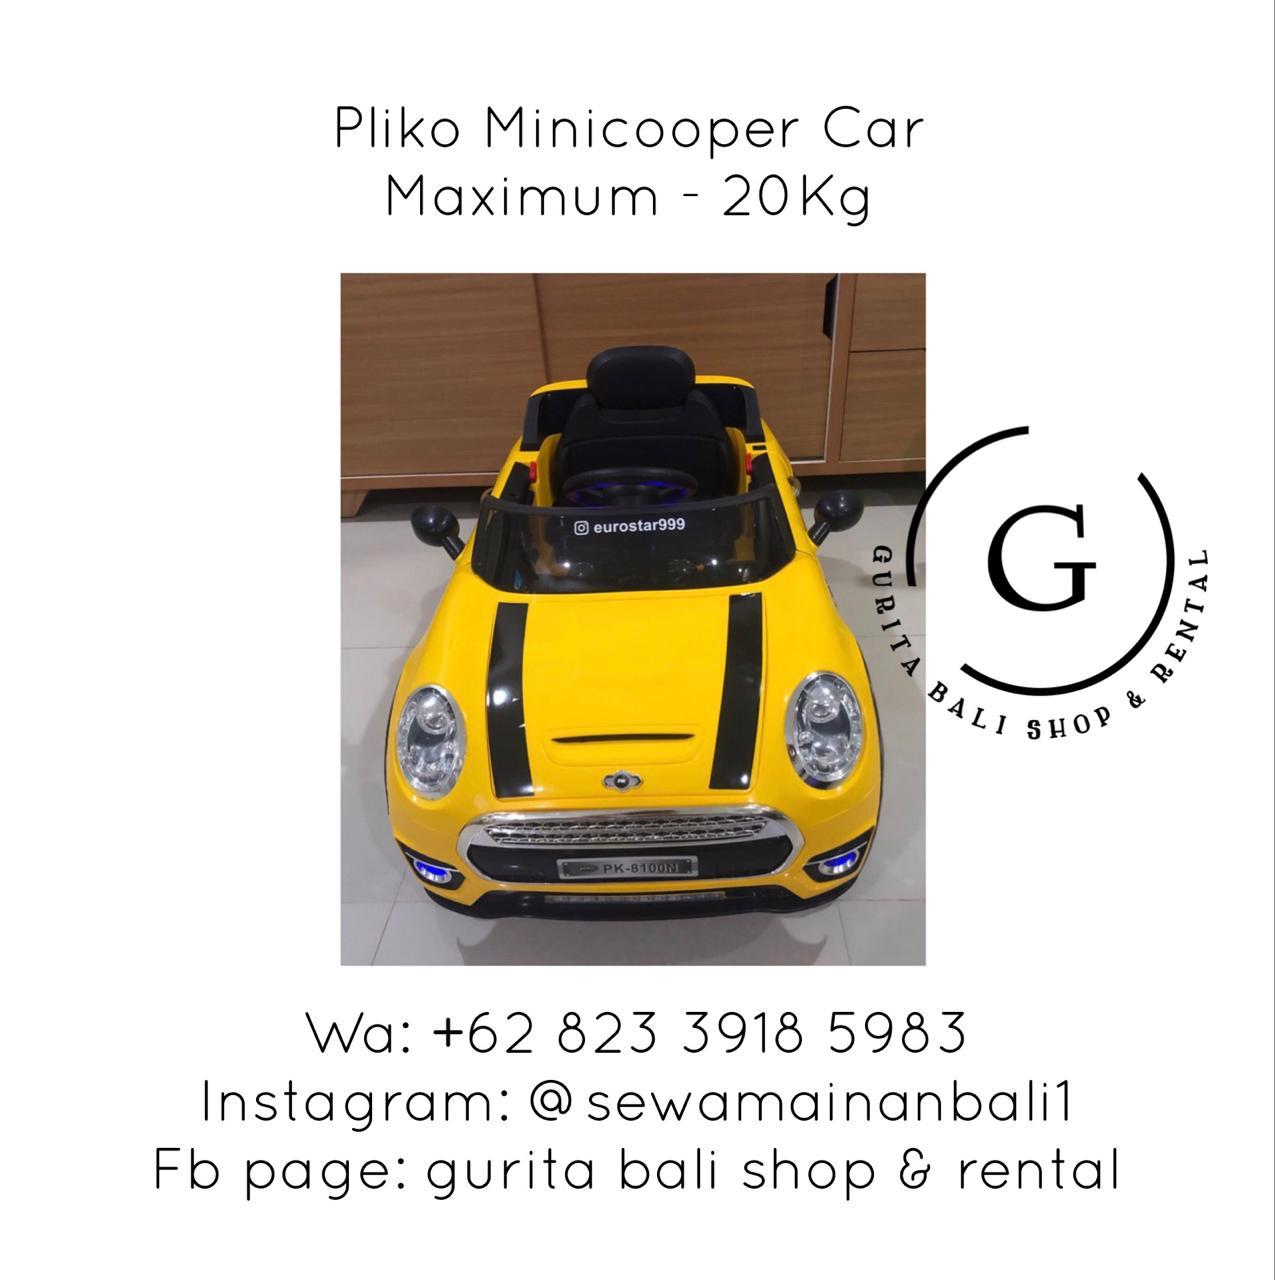 PLIKO MINICOOPER CAR 2